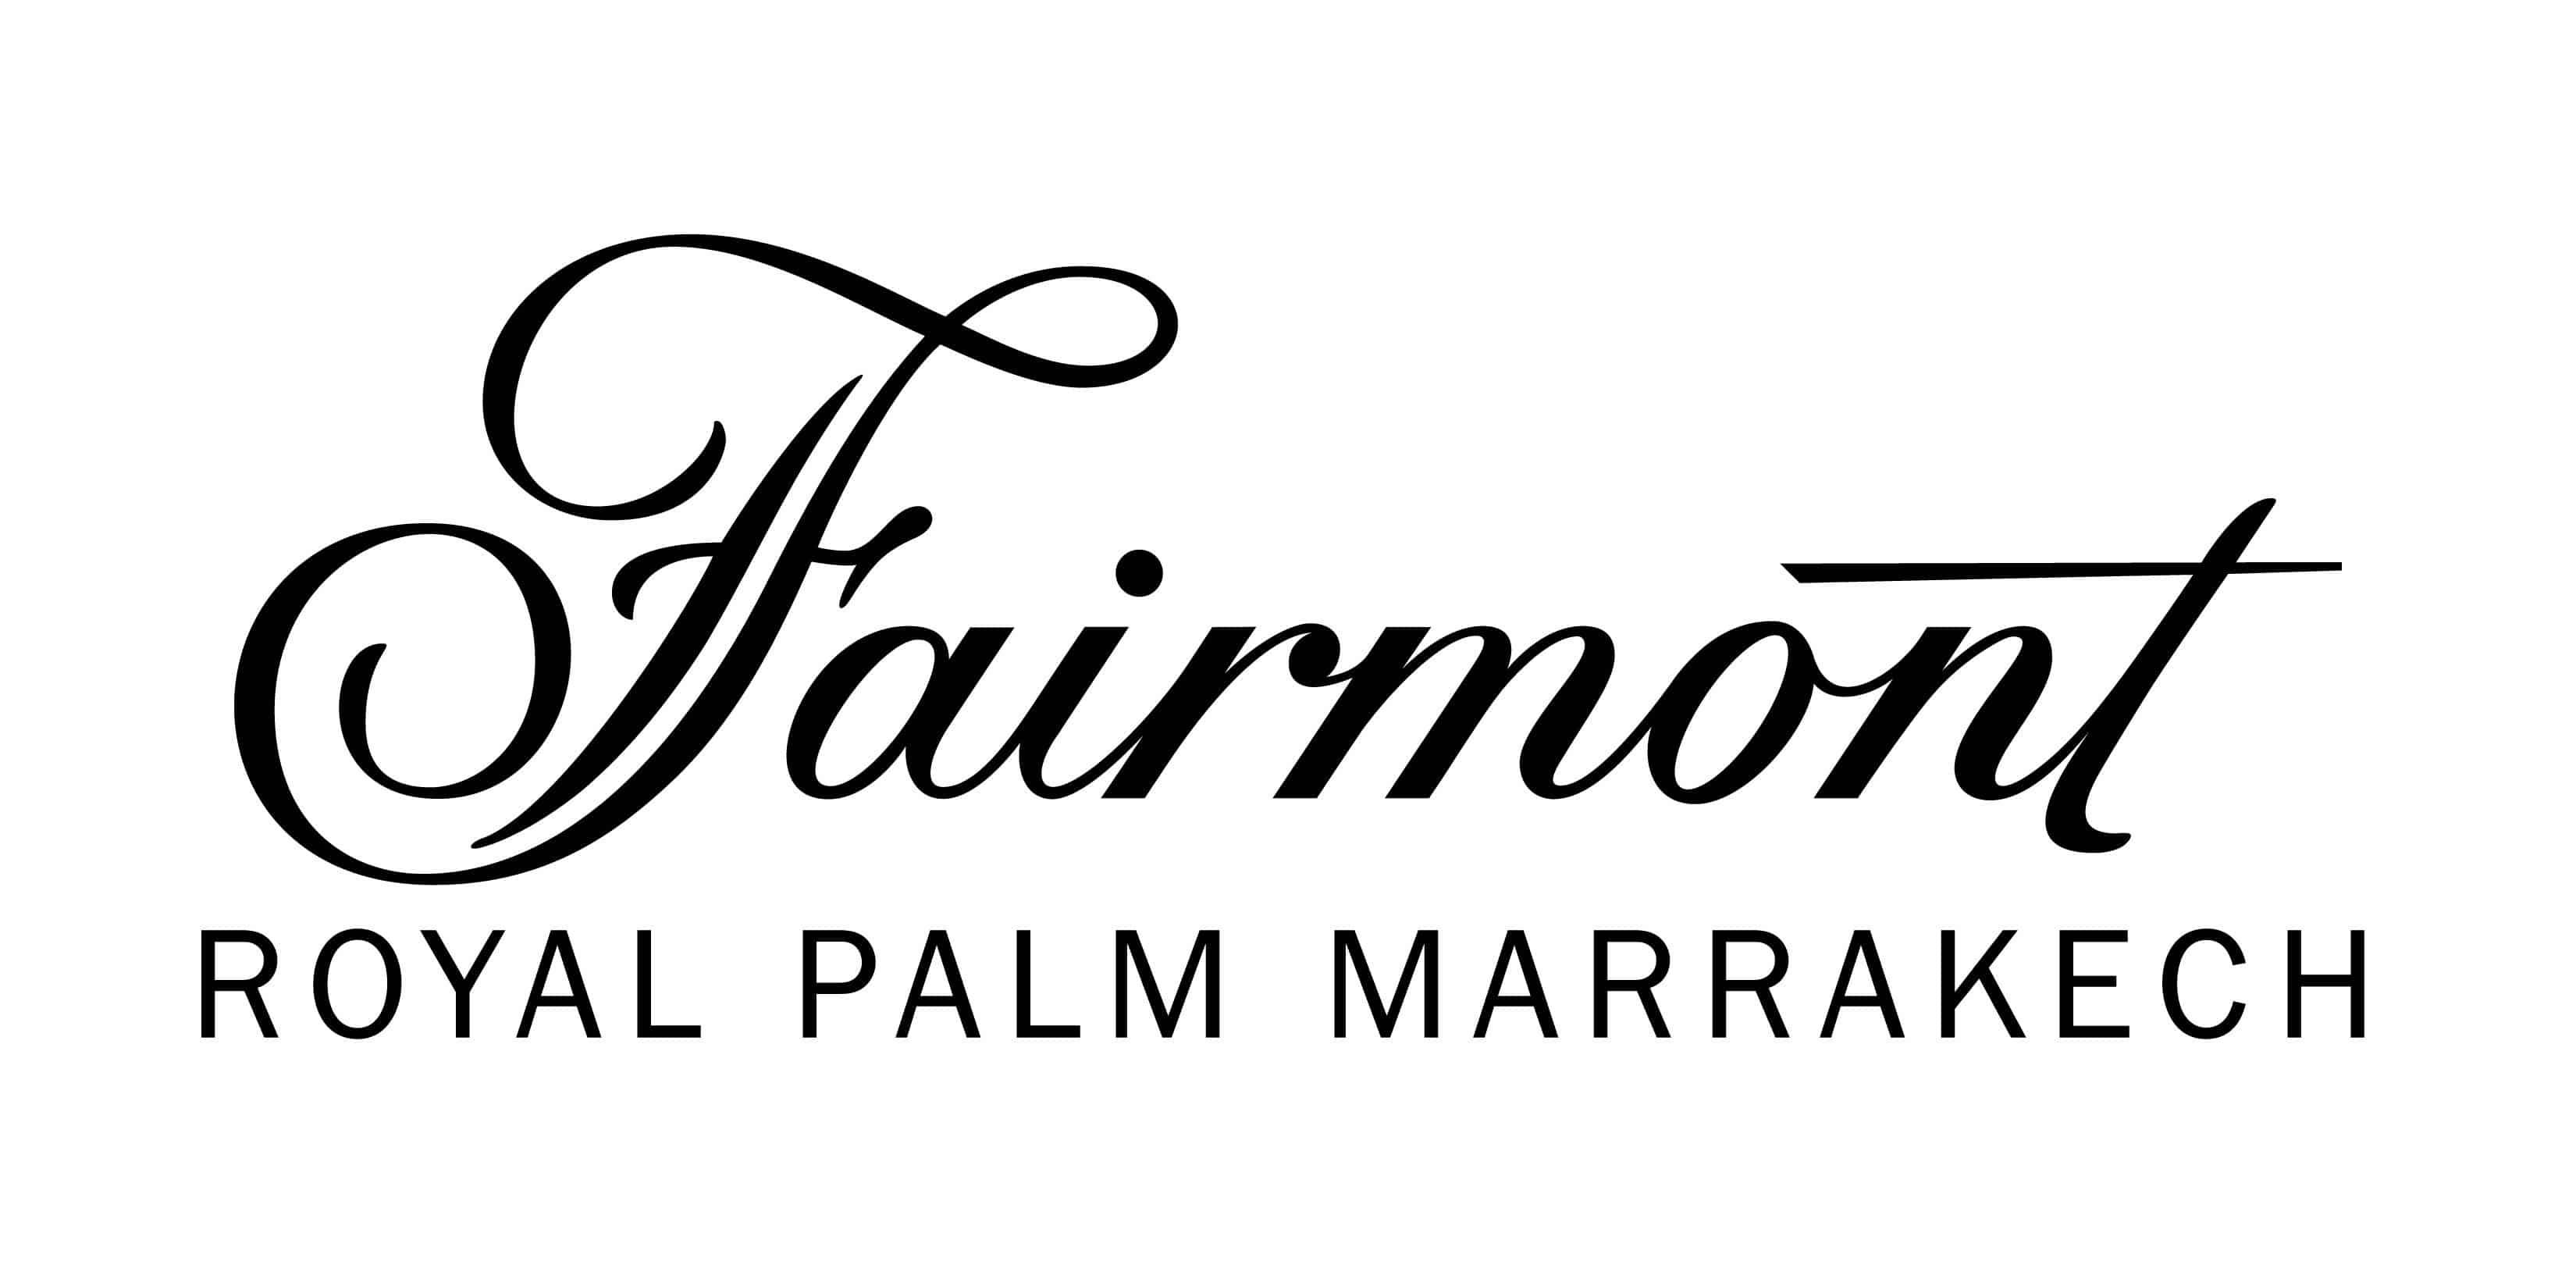 Fairmont royal palm marrakech logo